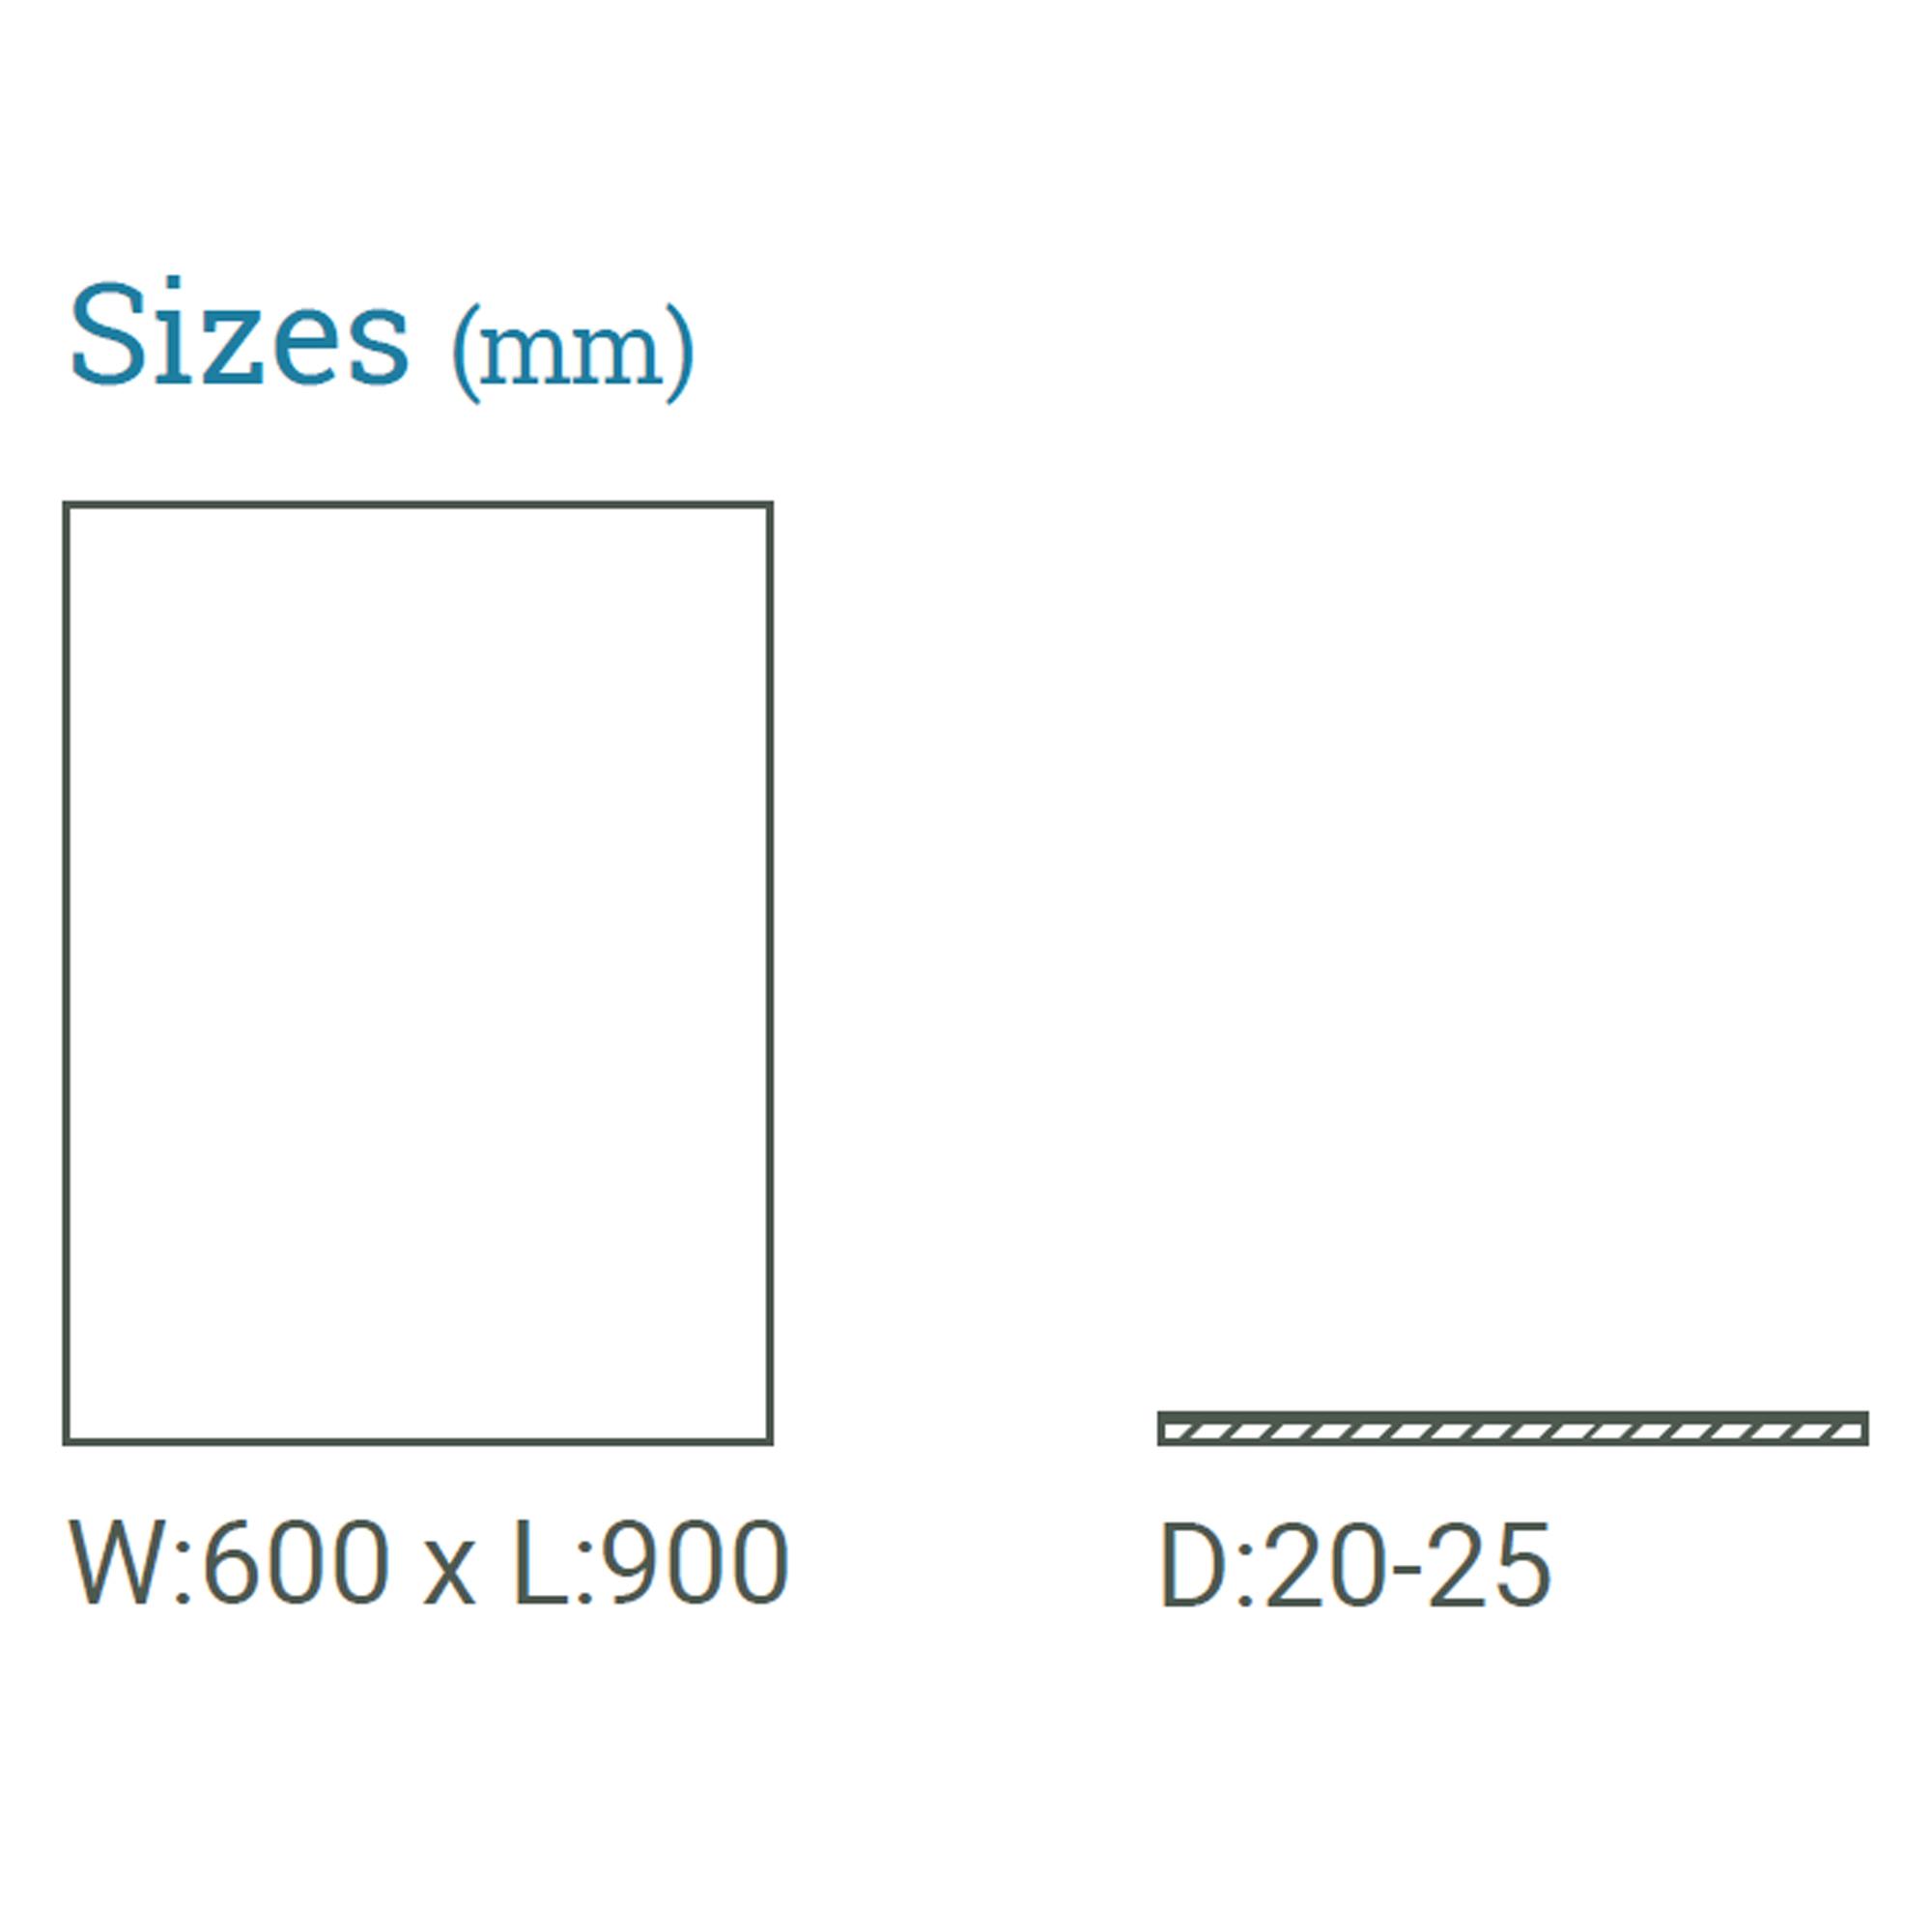 Black Slate Paving sizes available